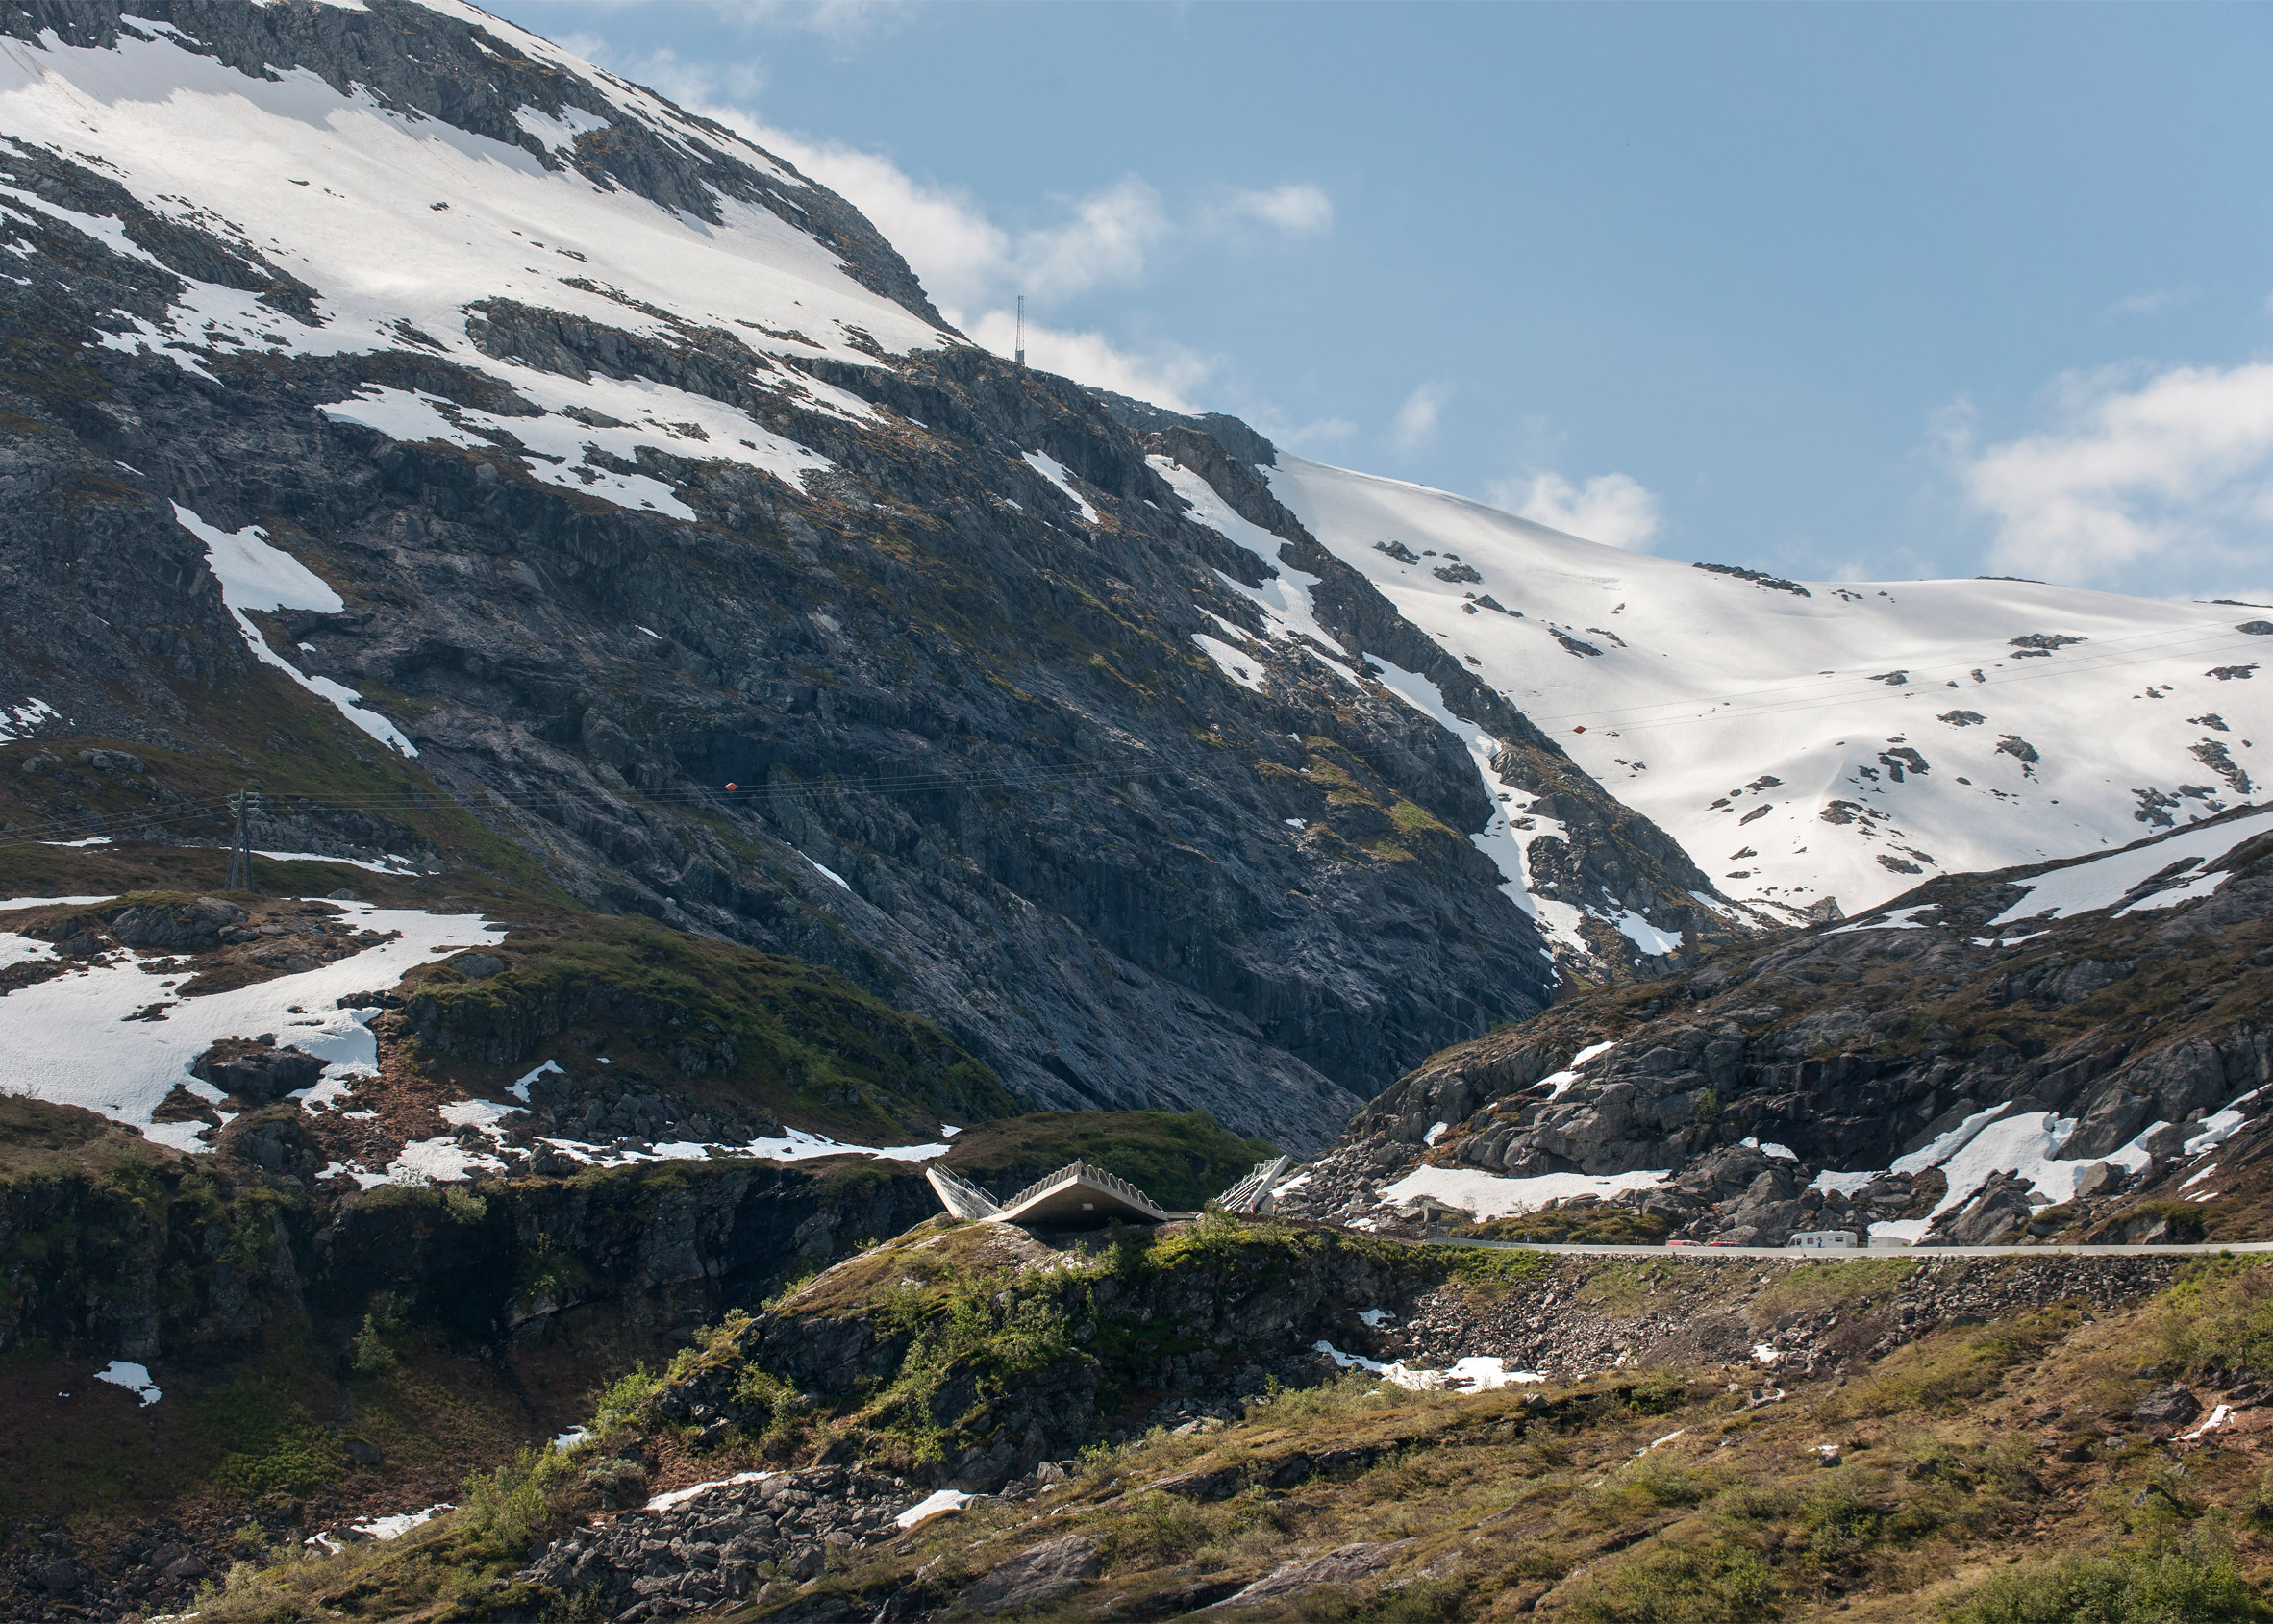 Utsikten tourist route in Norway